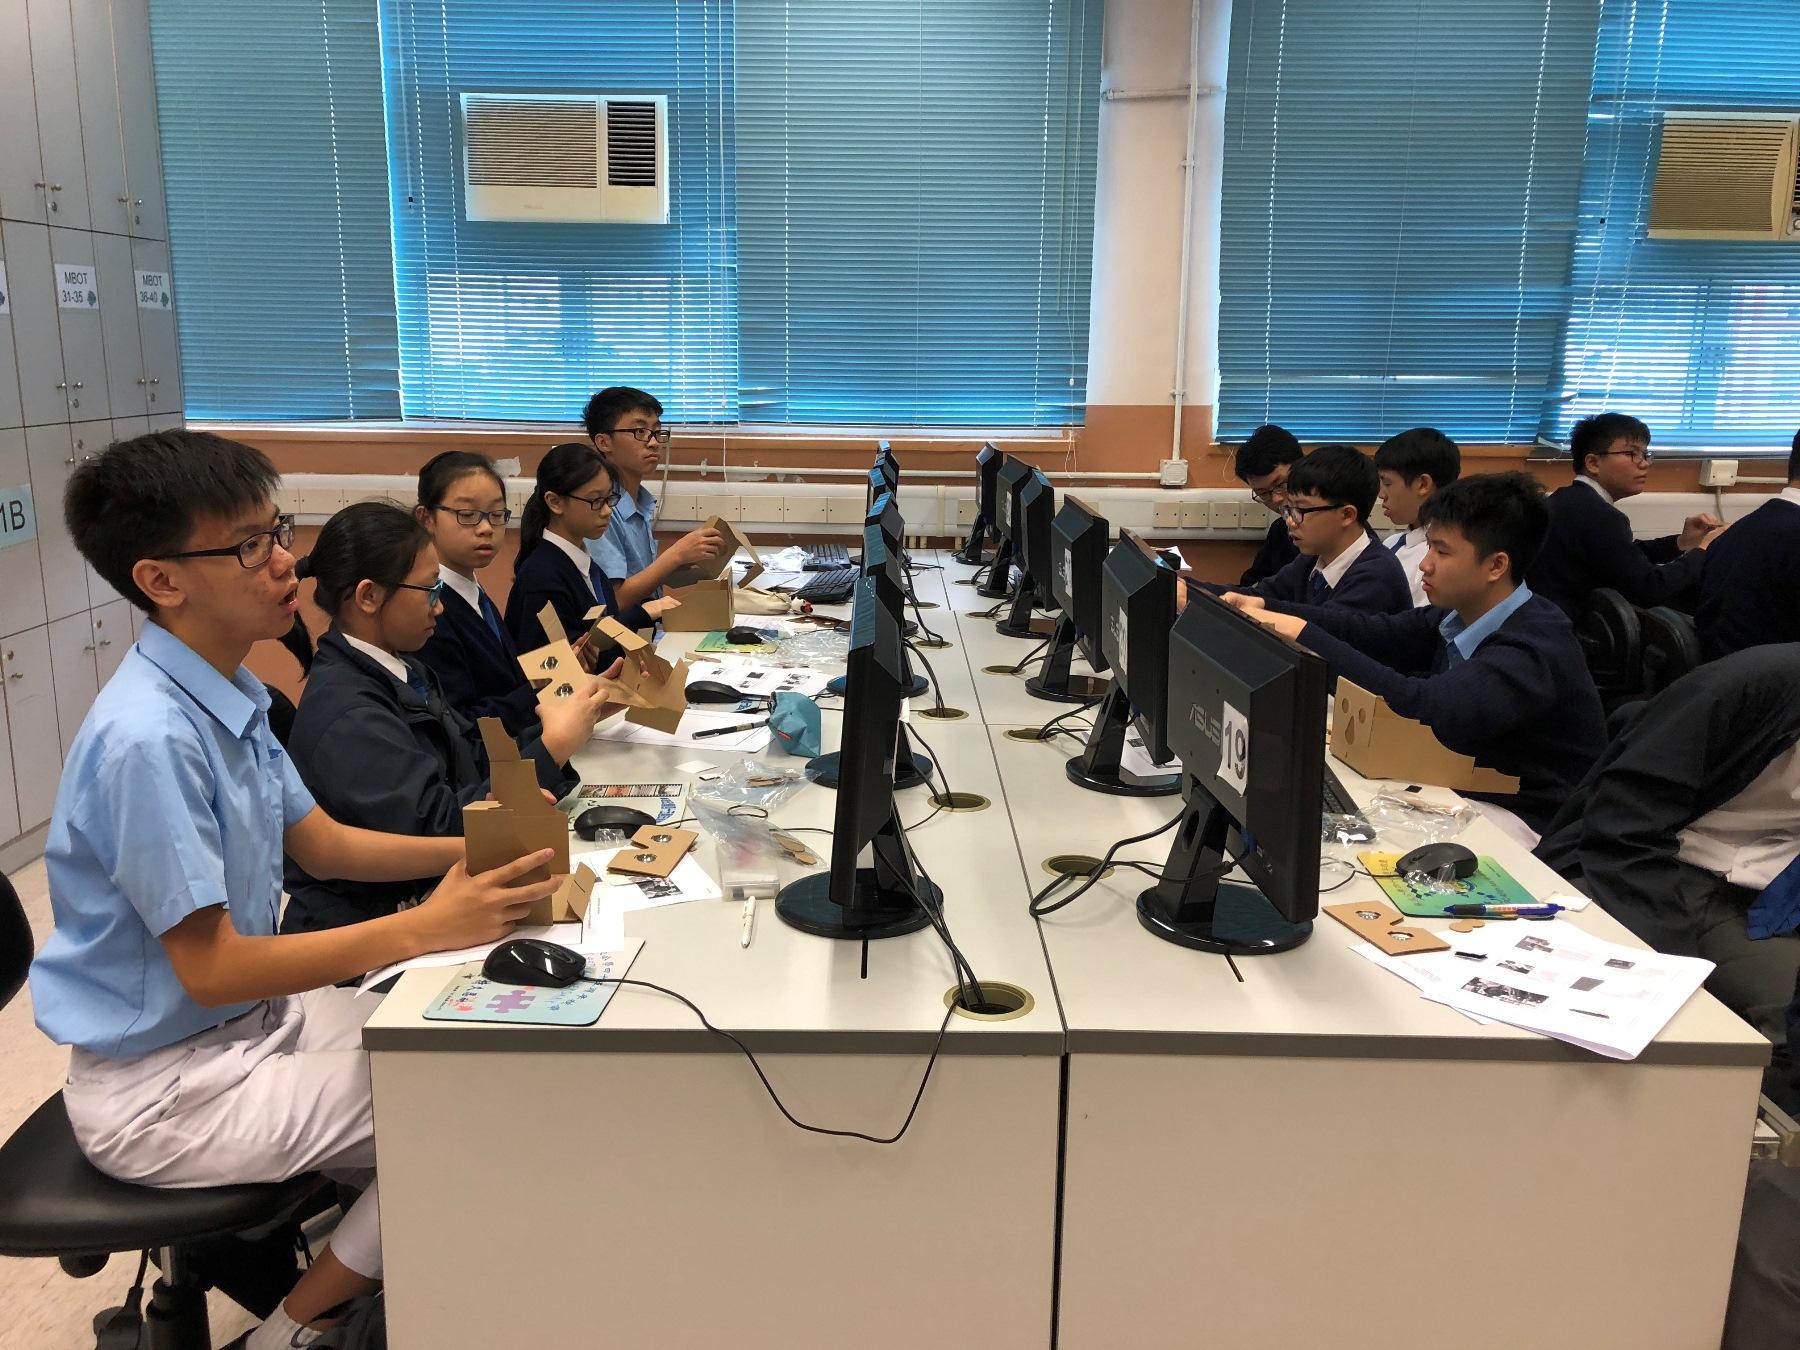 http://npc.edu.hk/sites/default/files/img_3508.jpg